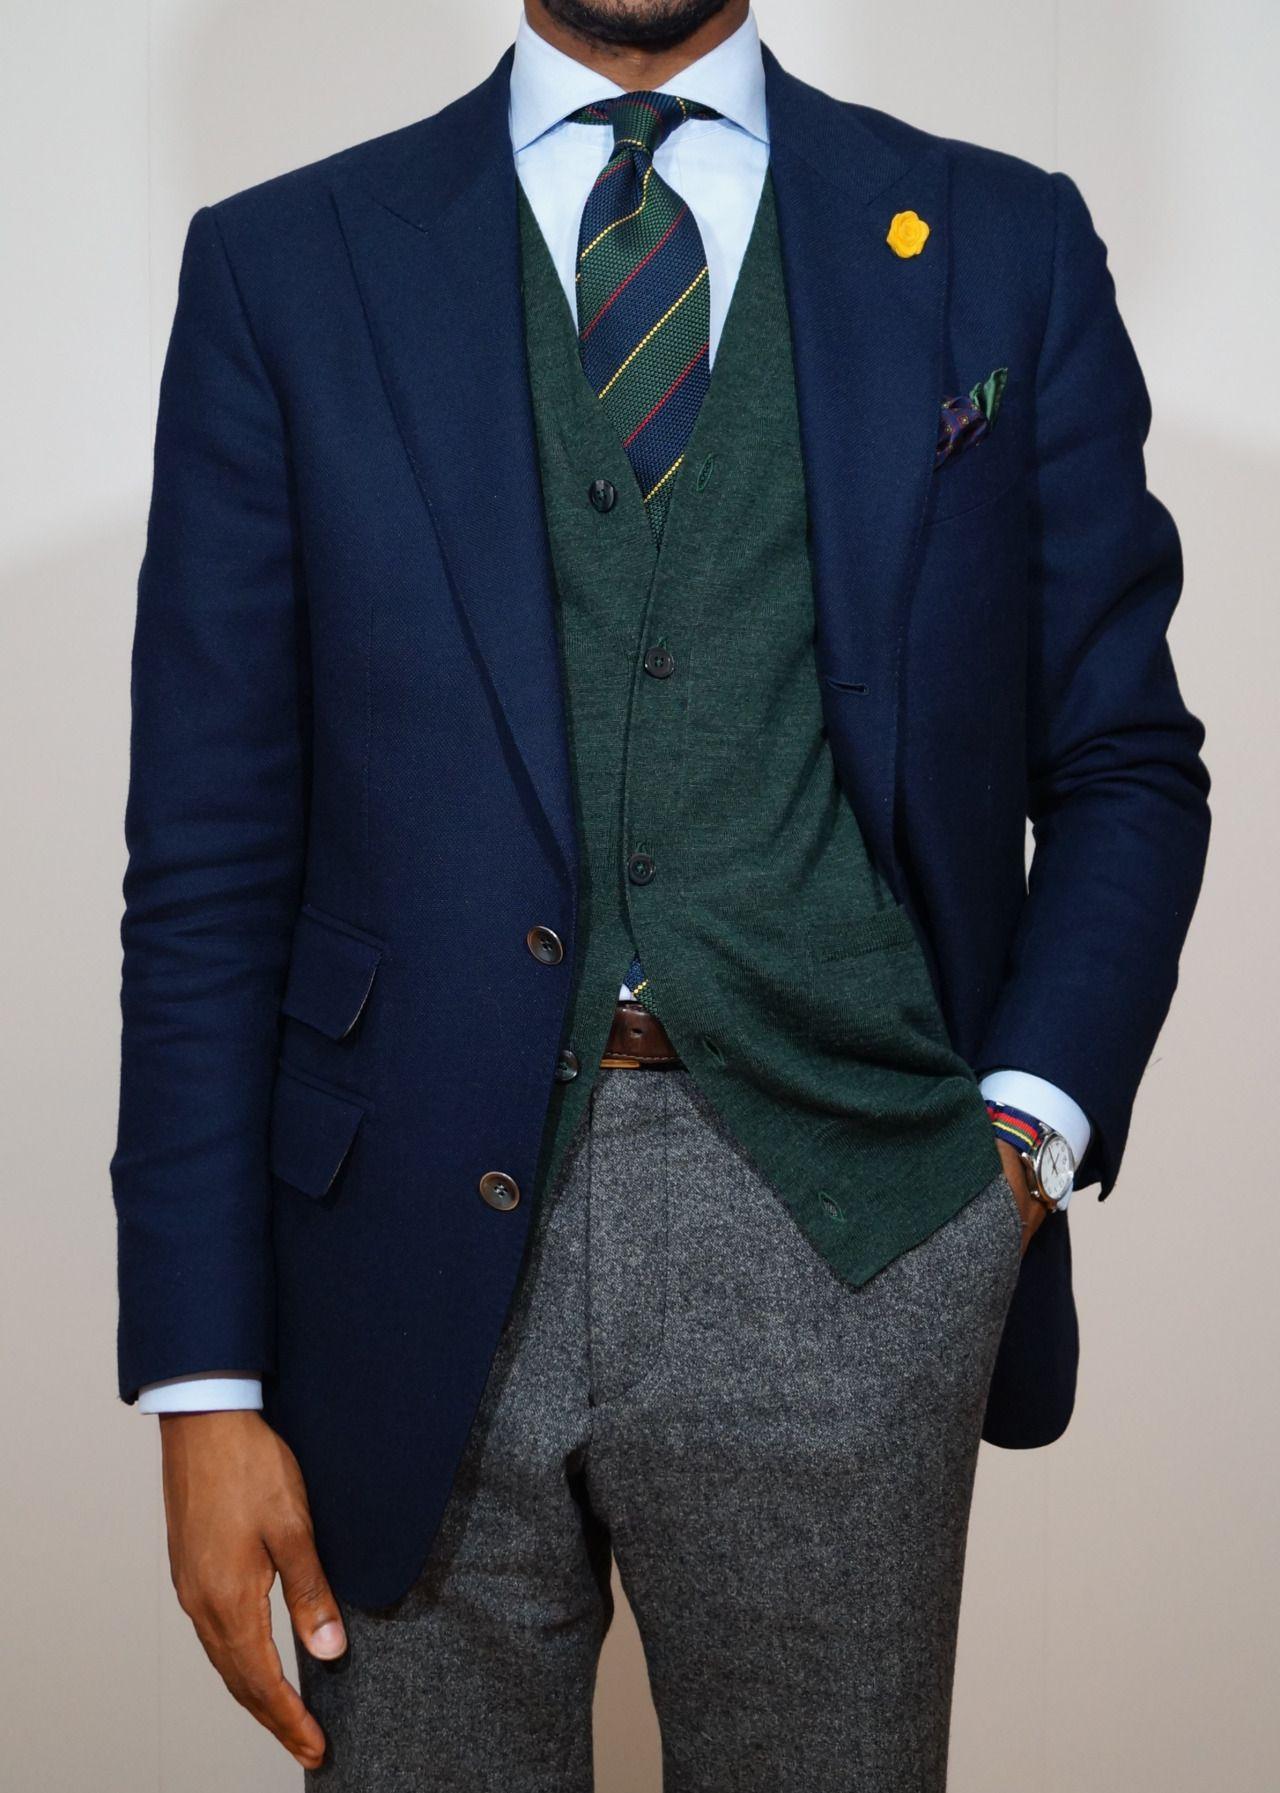 Navy blazer, light blue shirt, green & navy Argyle